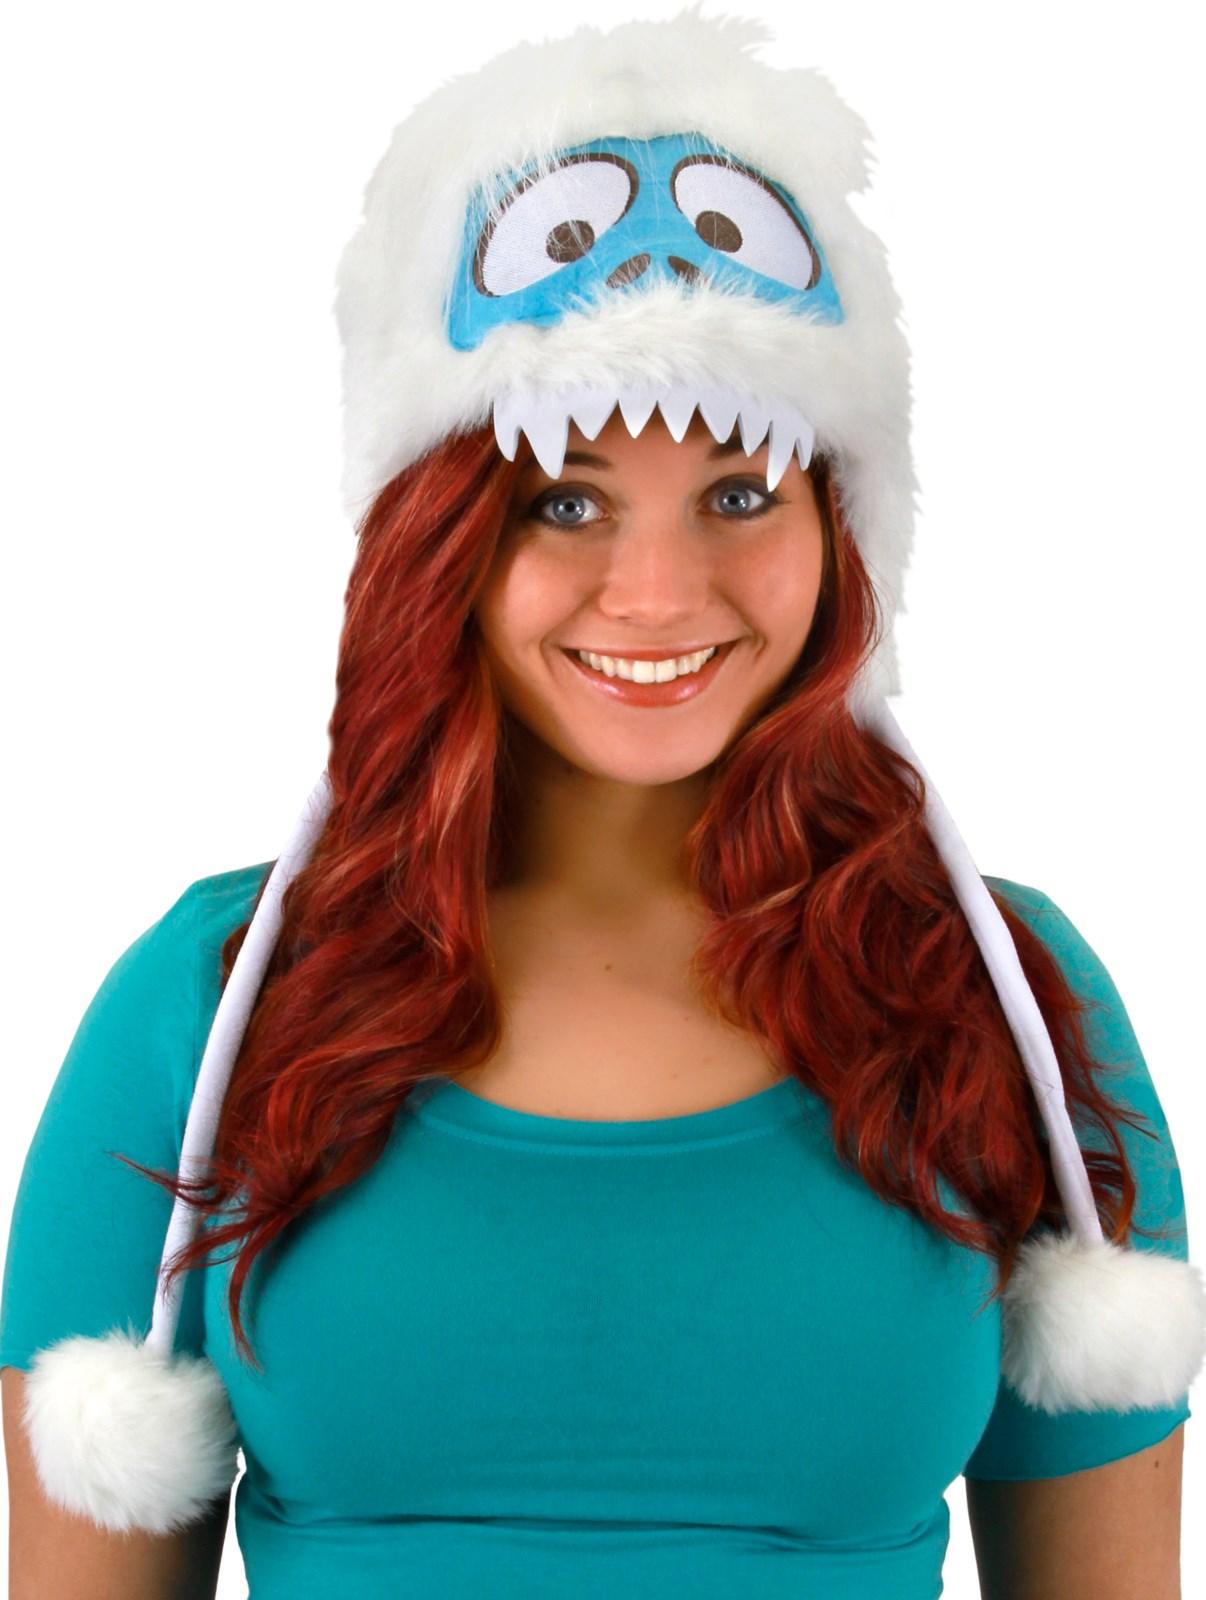 Bumble - Hoodie Hat